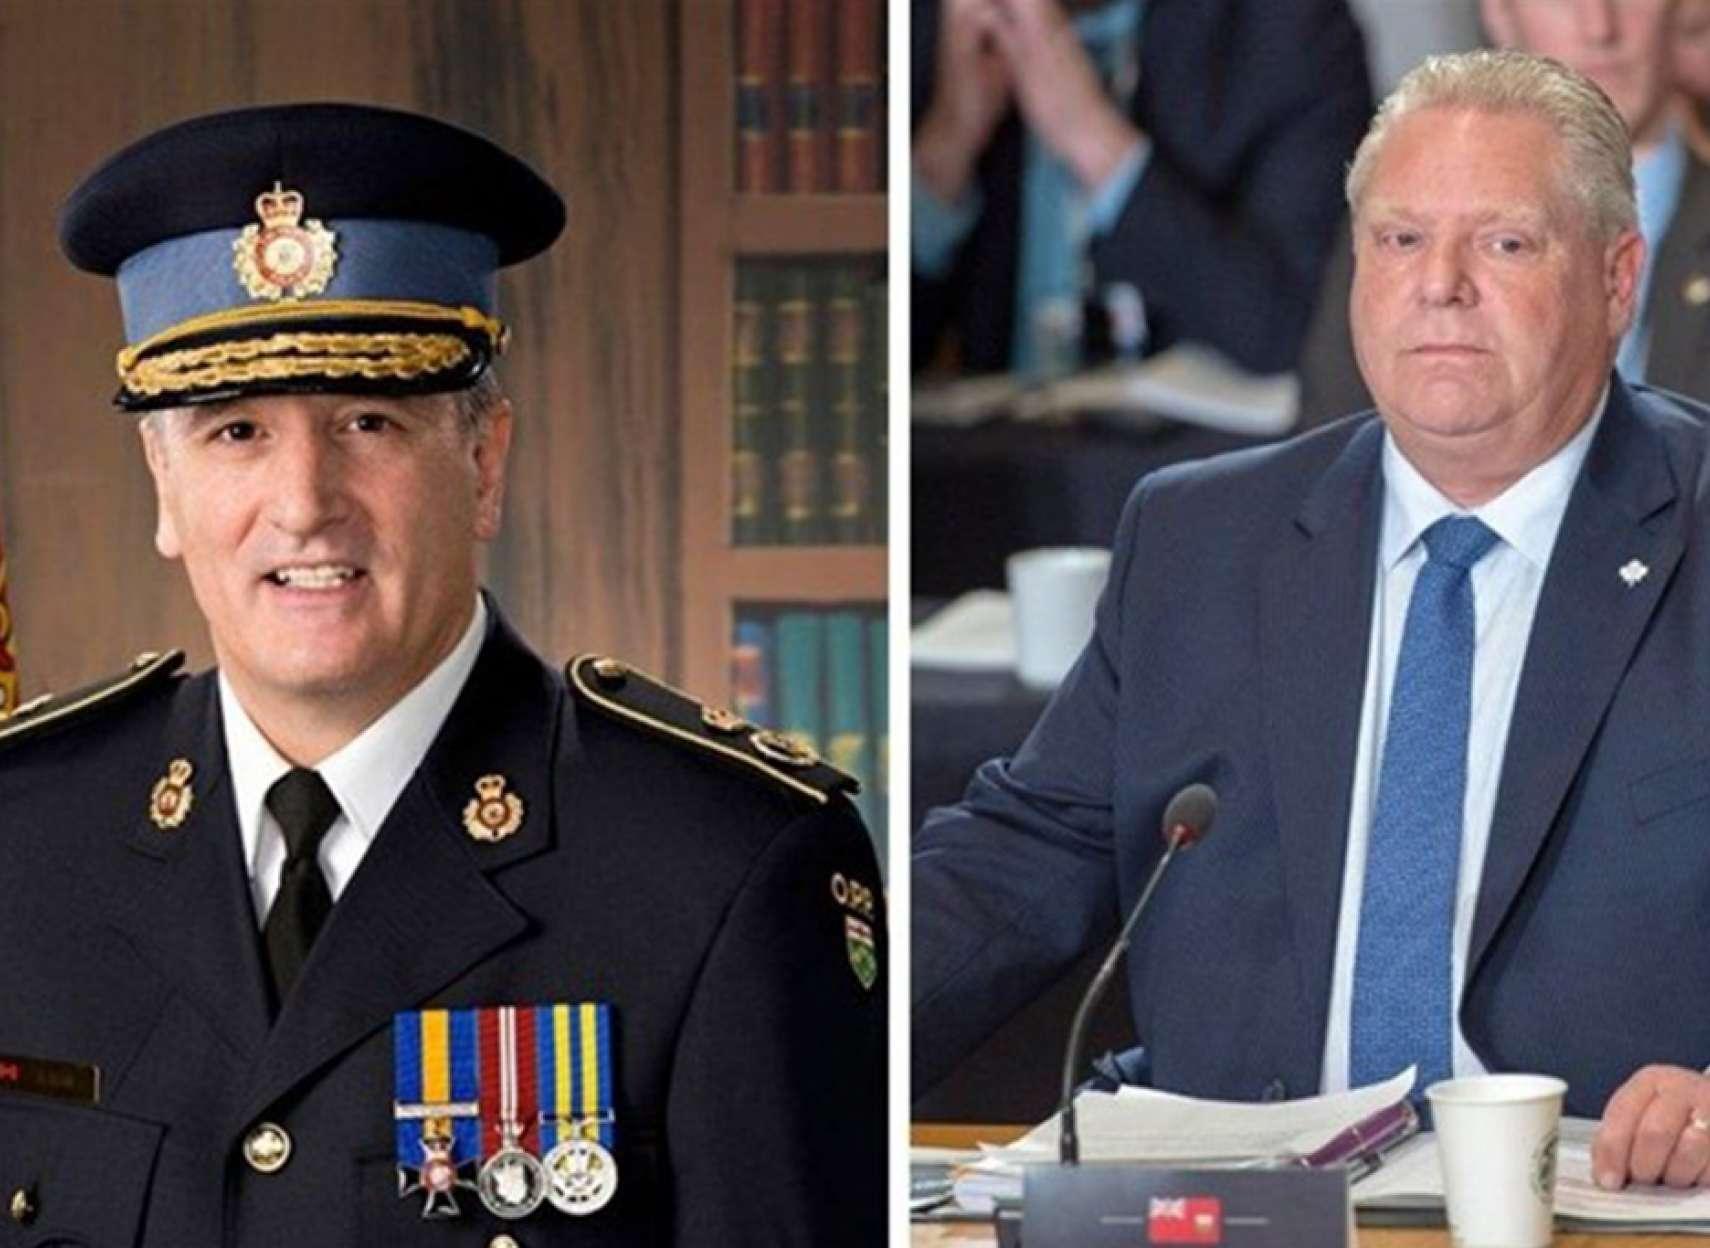 اخبار-تورنتو-پلیس-اخراجی-فورد-را-سو-کرد